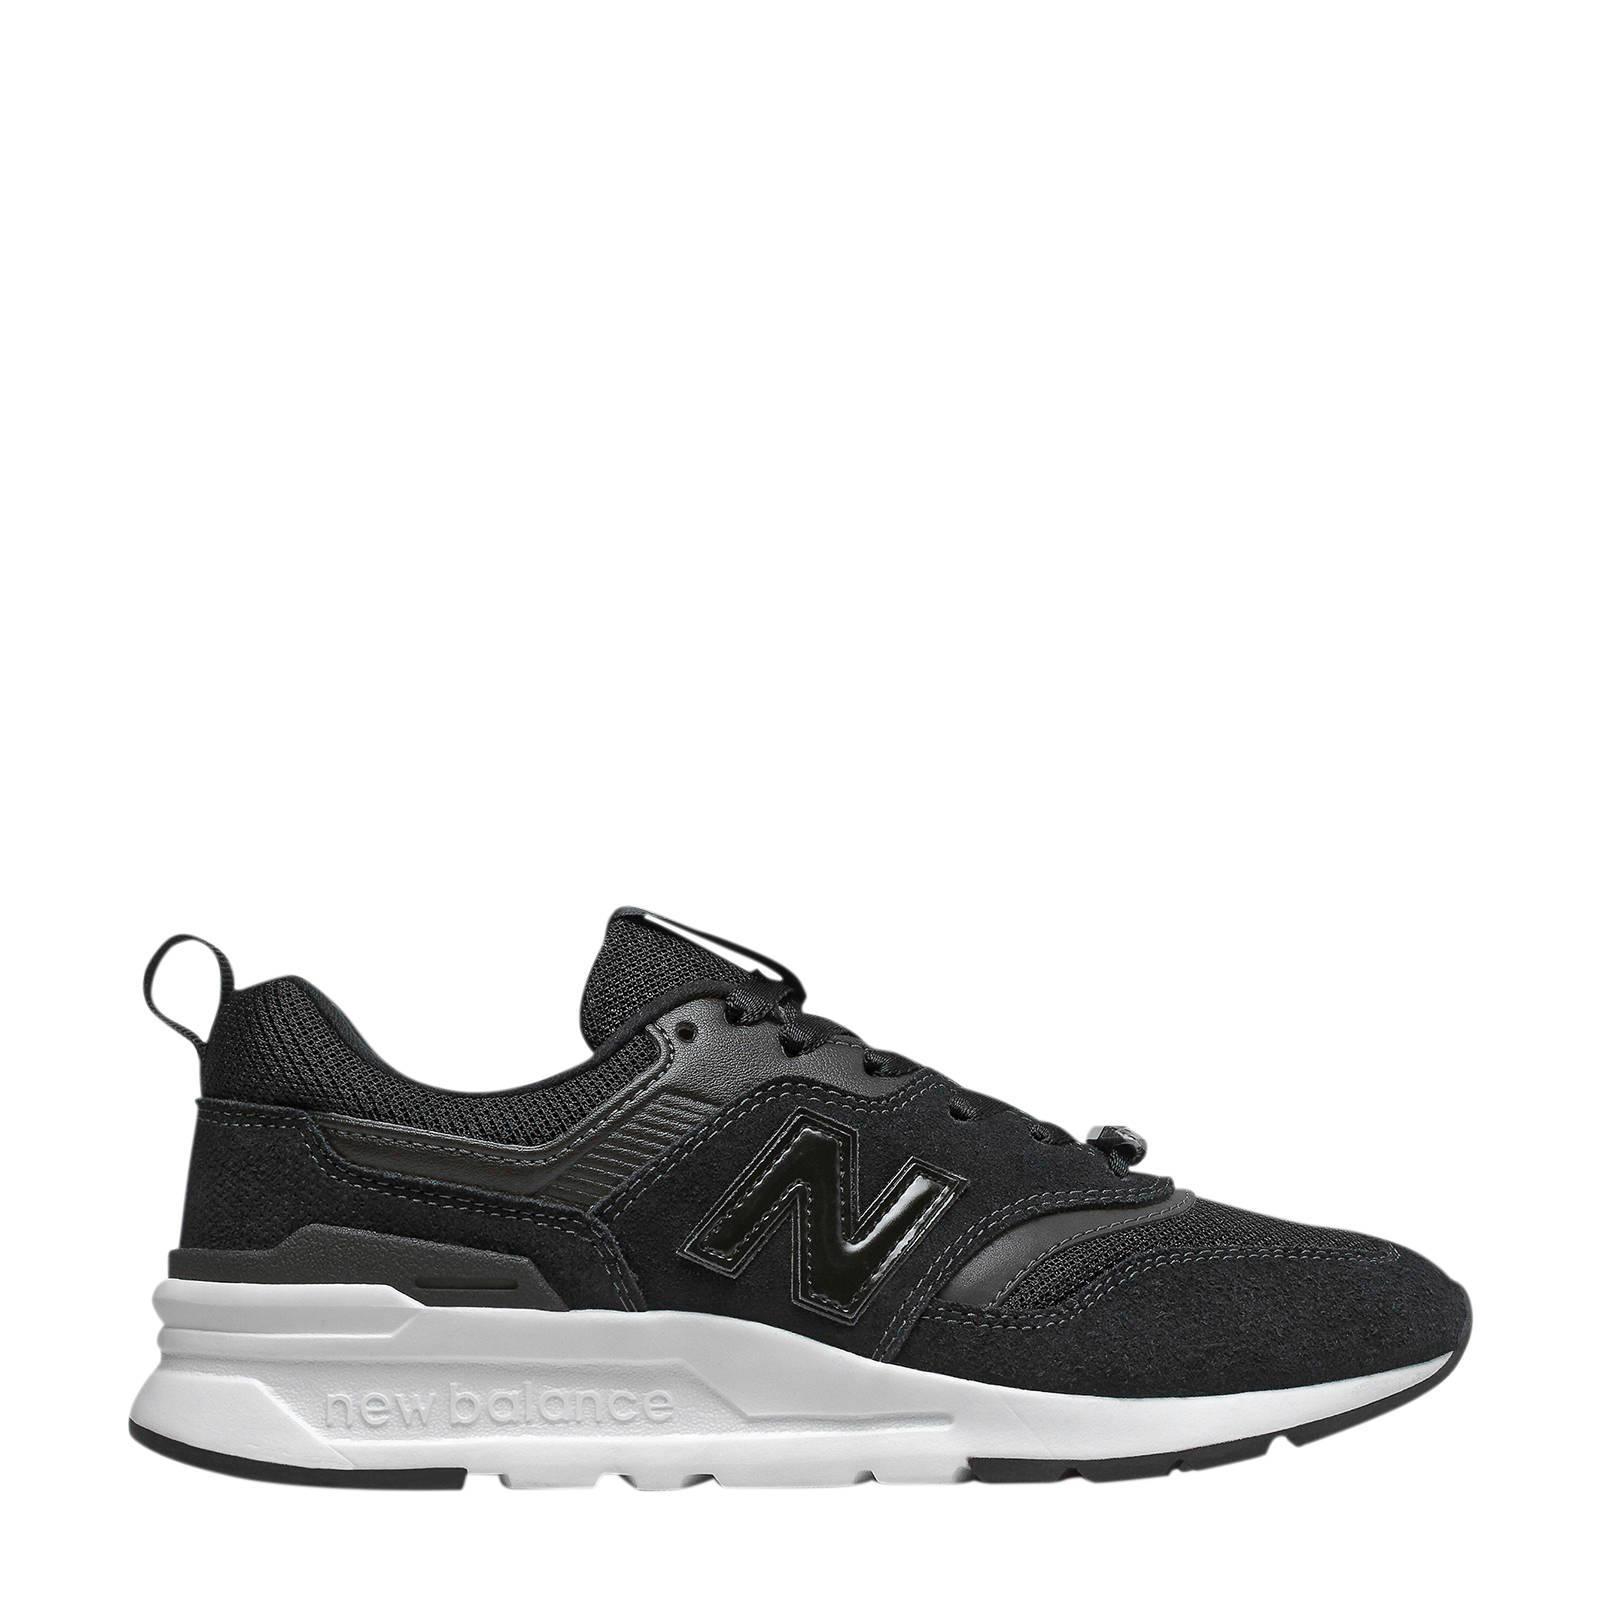 New Balance 997 sneakers zwartwit | wehkamp